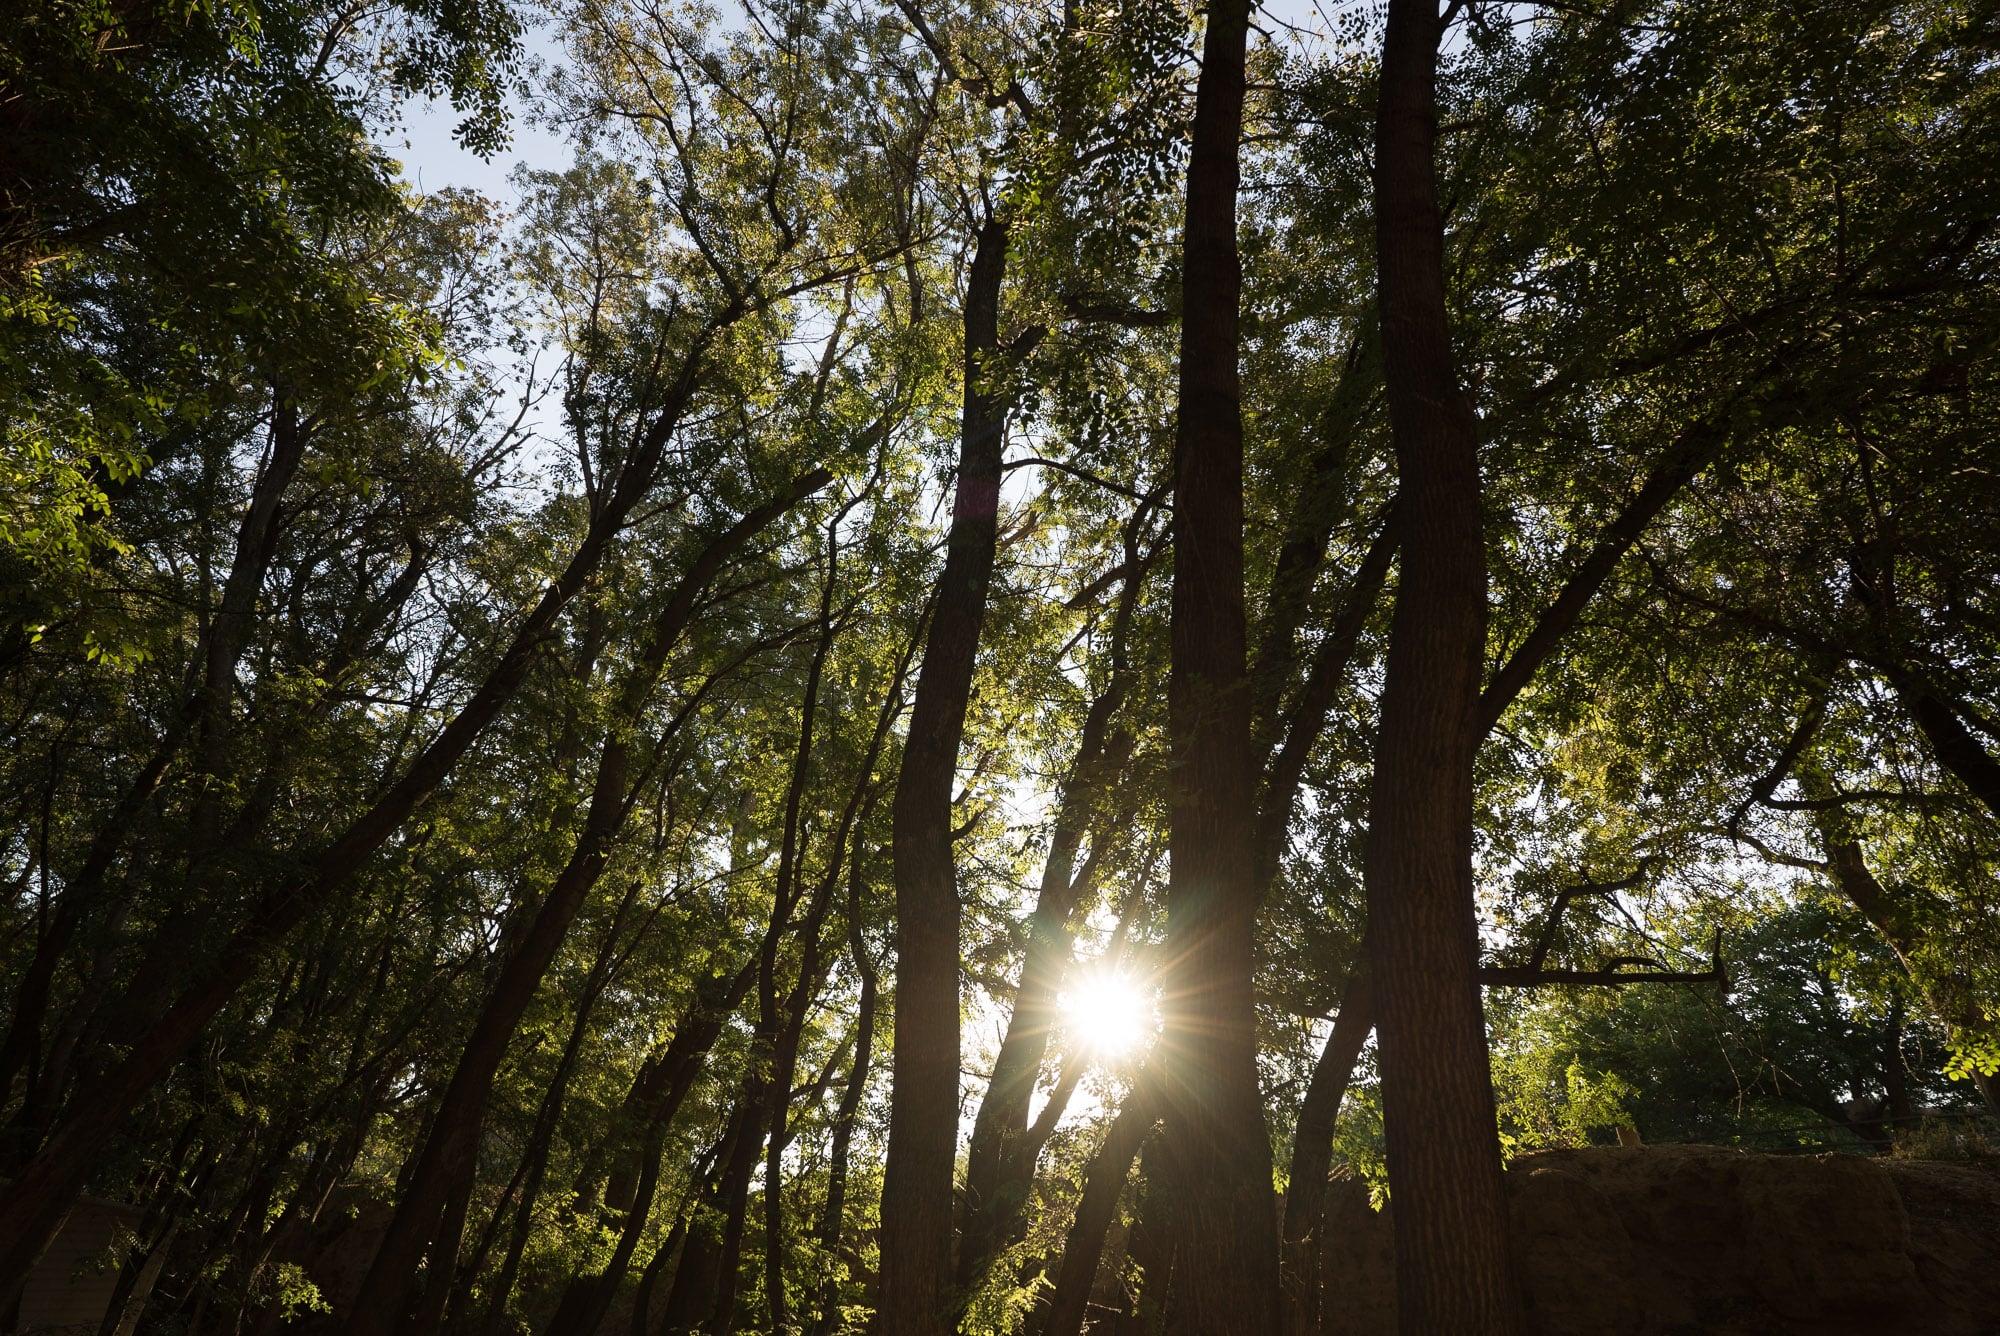 Ash Grove trees